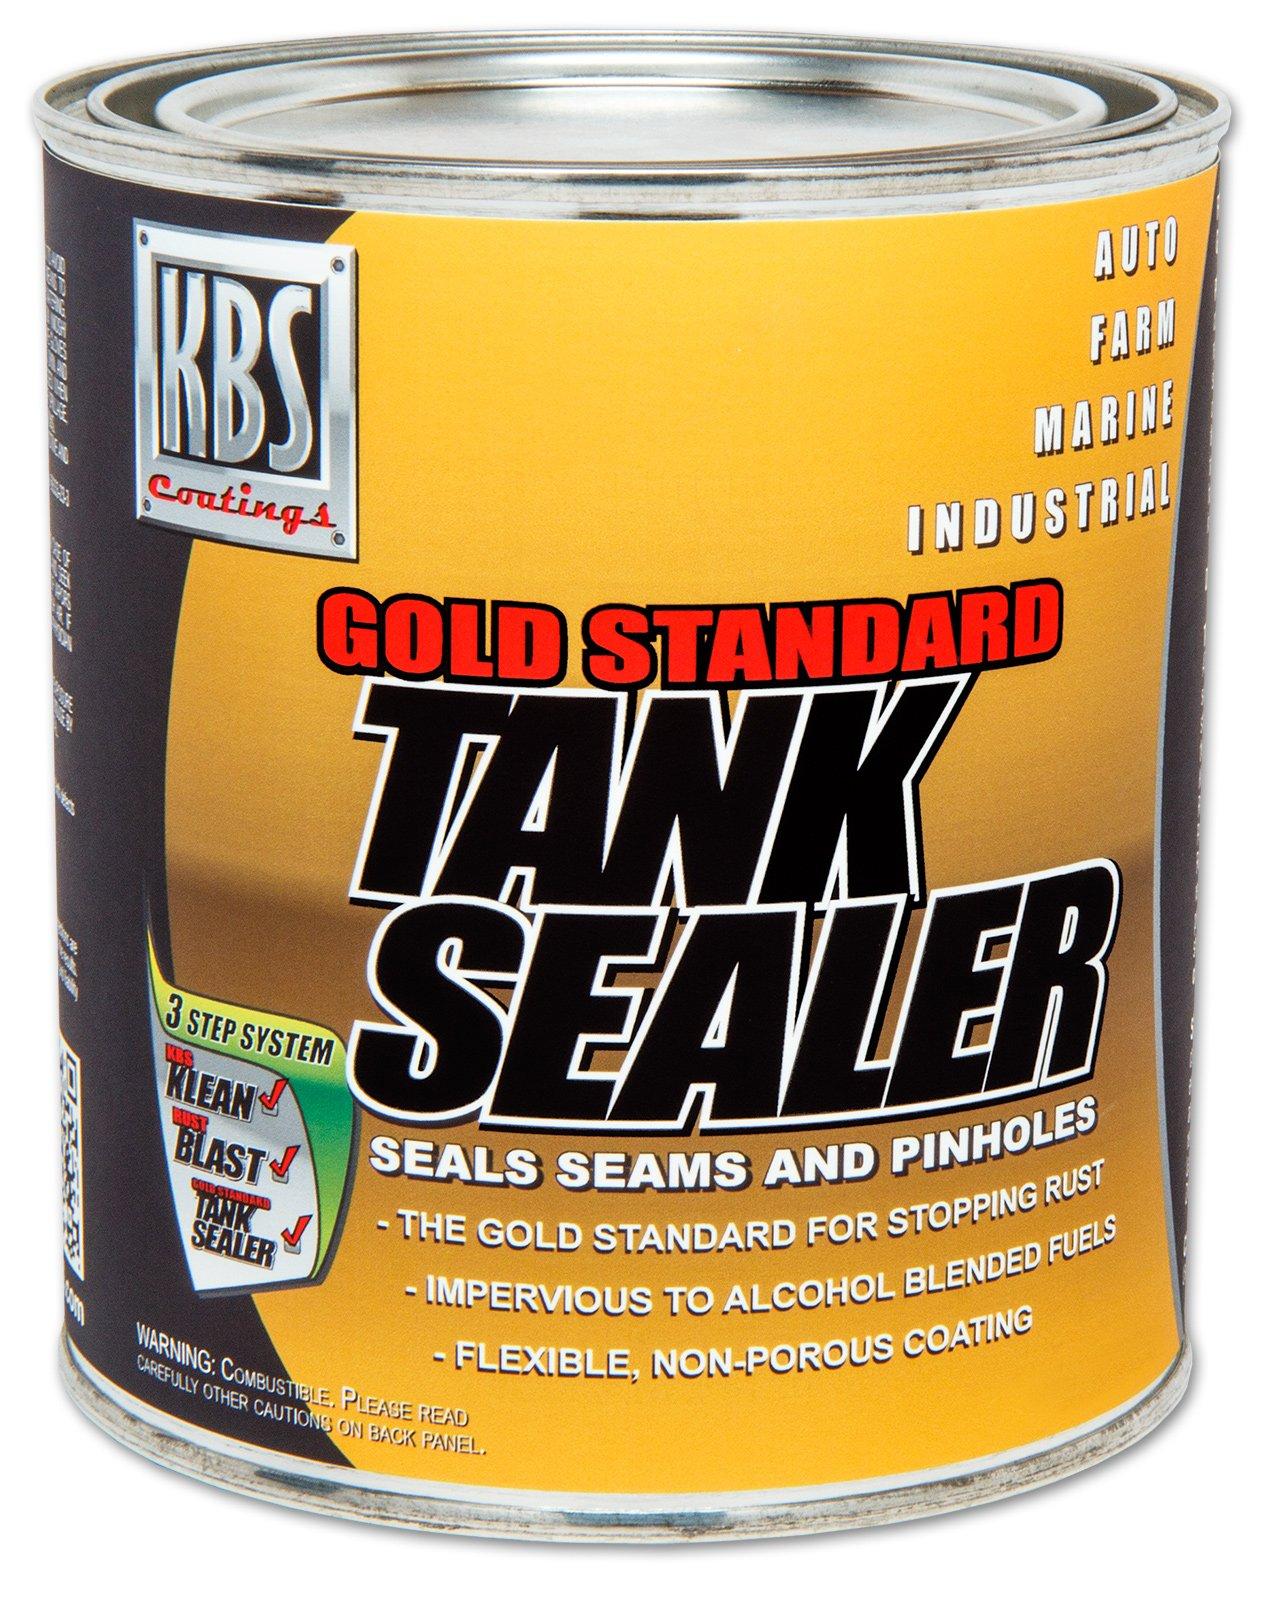 KBS Coatings 5500 Gold Standard Tank Sealer - 1 Gallon by KBS Coatings (Image #1)